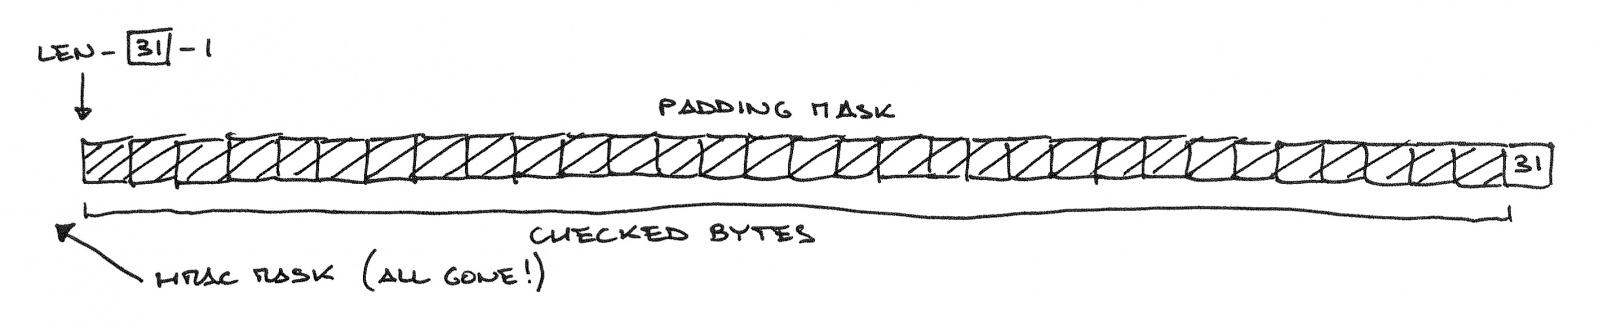 Padding Oracle Attack: криптография по-прежнему пугает - 9